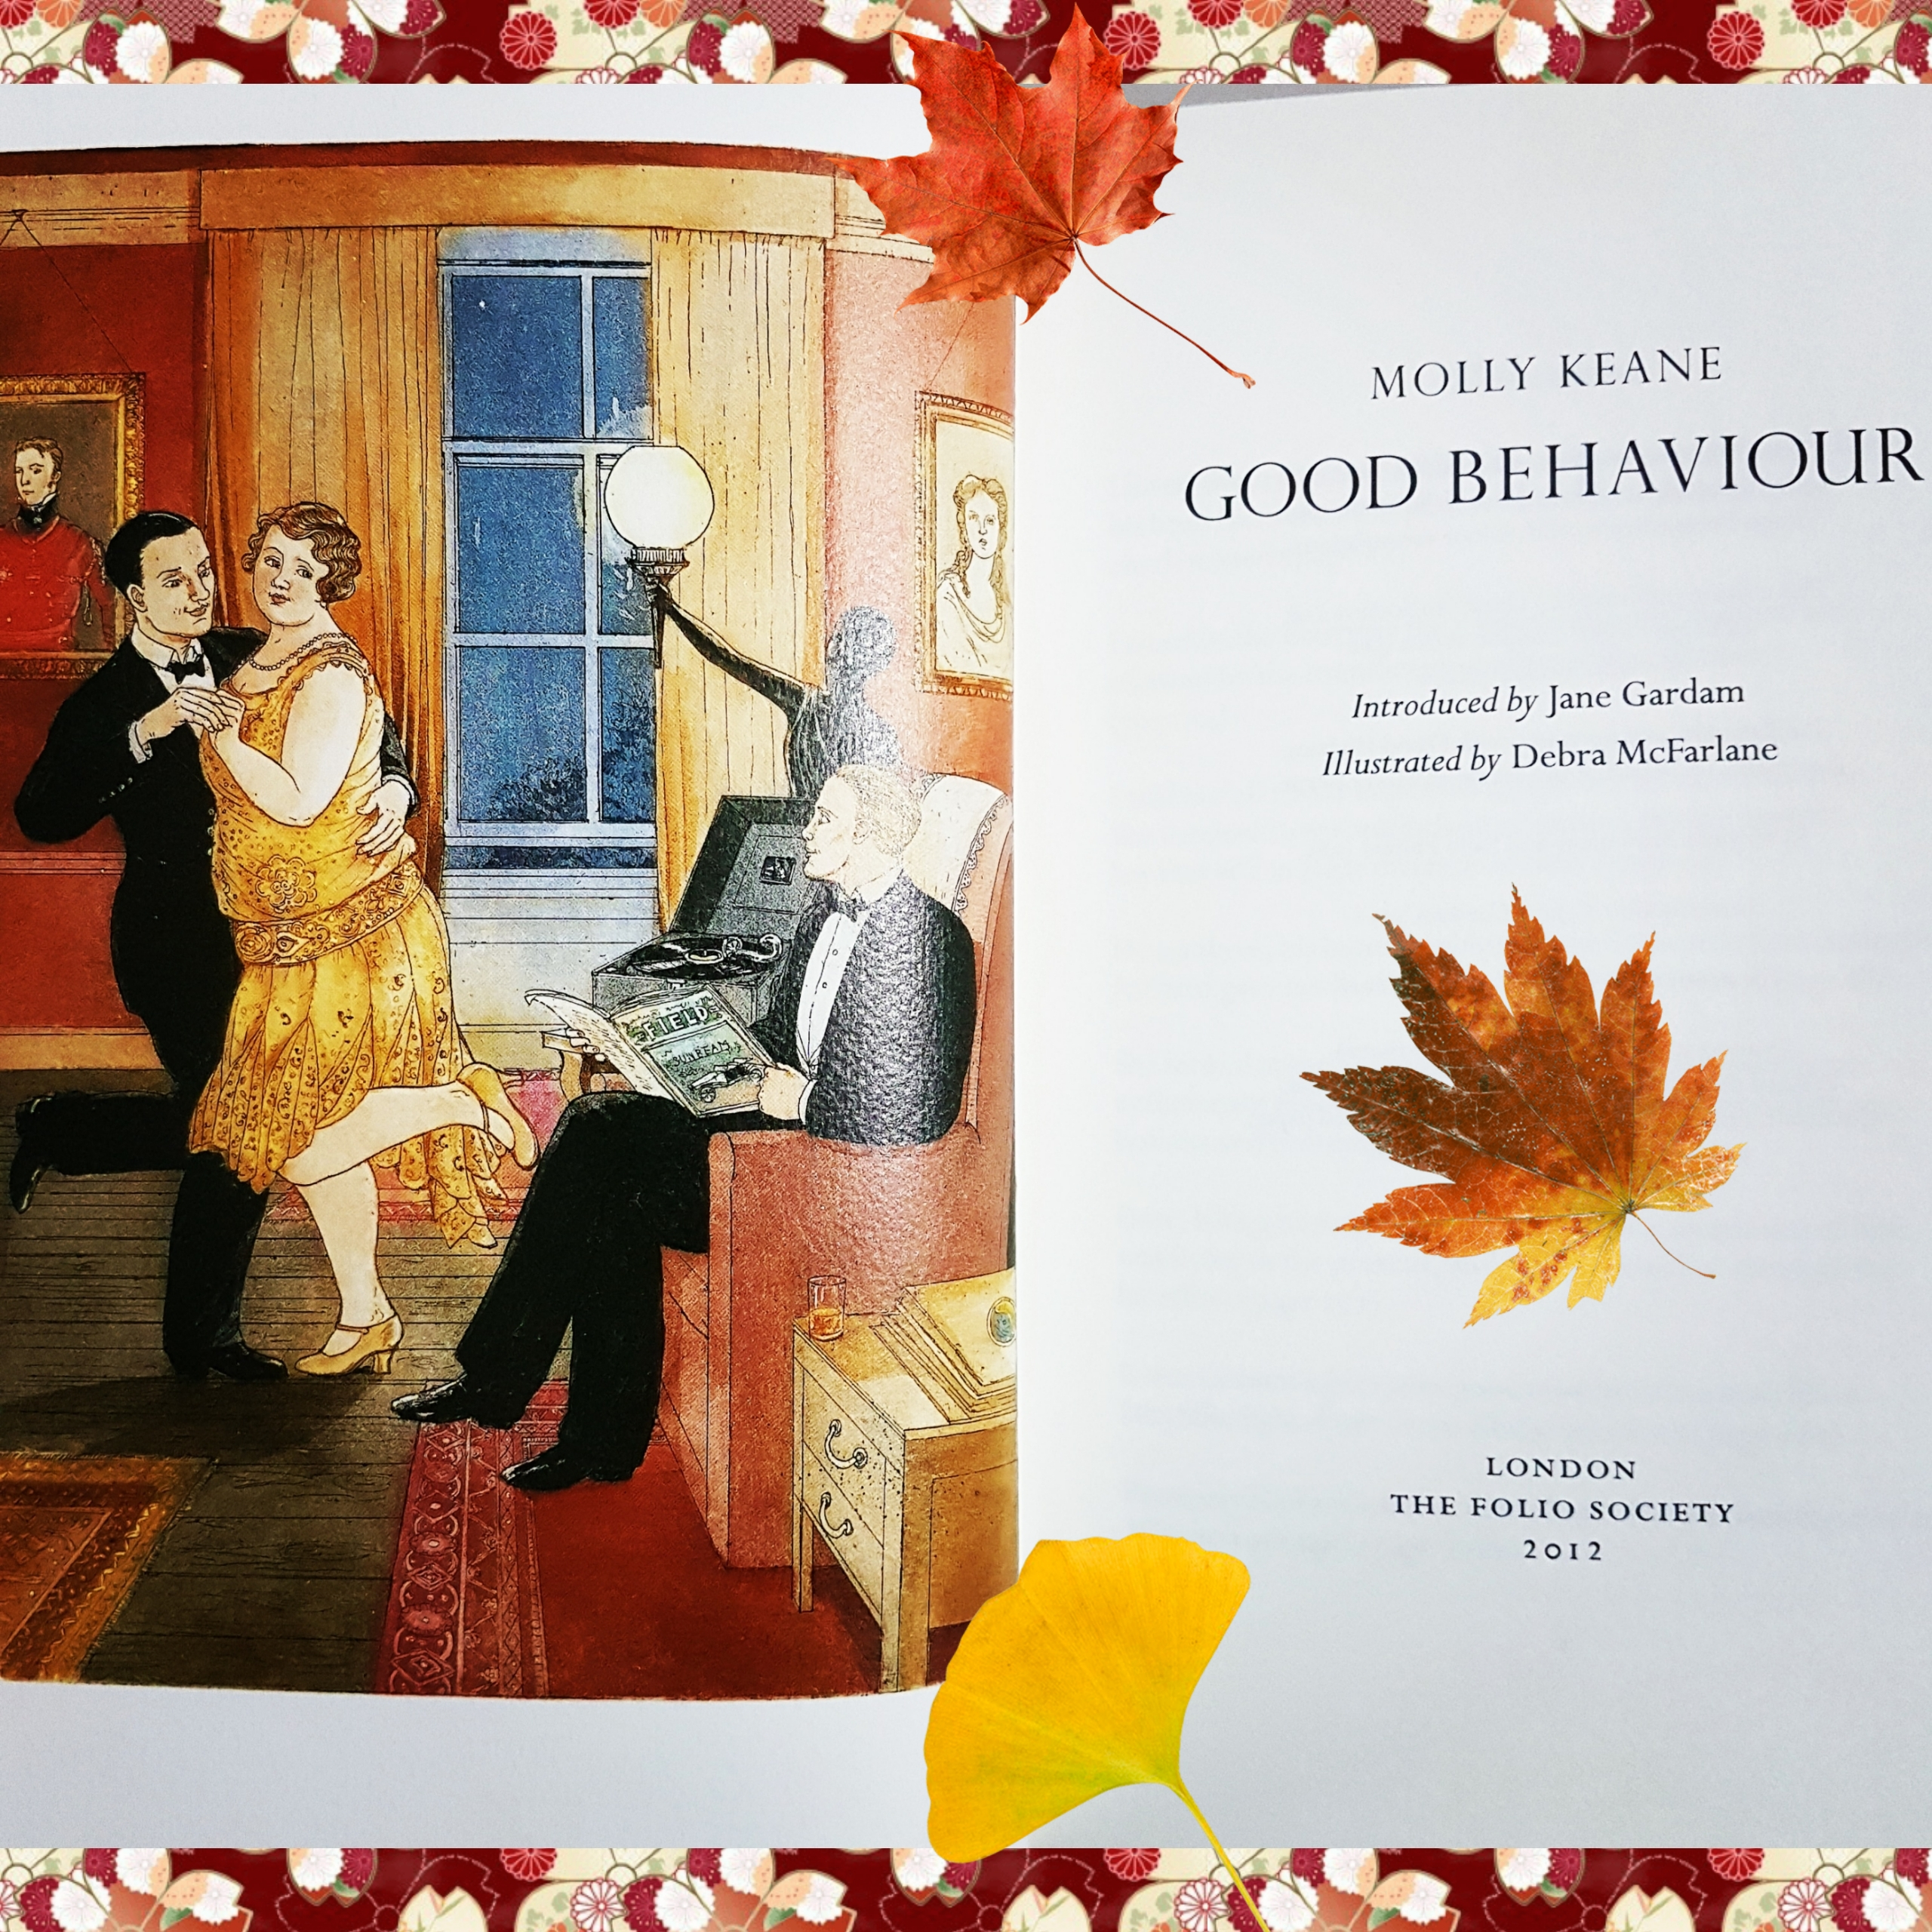 Good Behaviour frontispiece